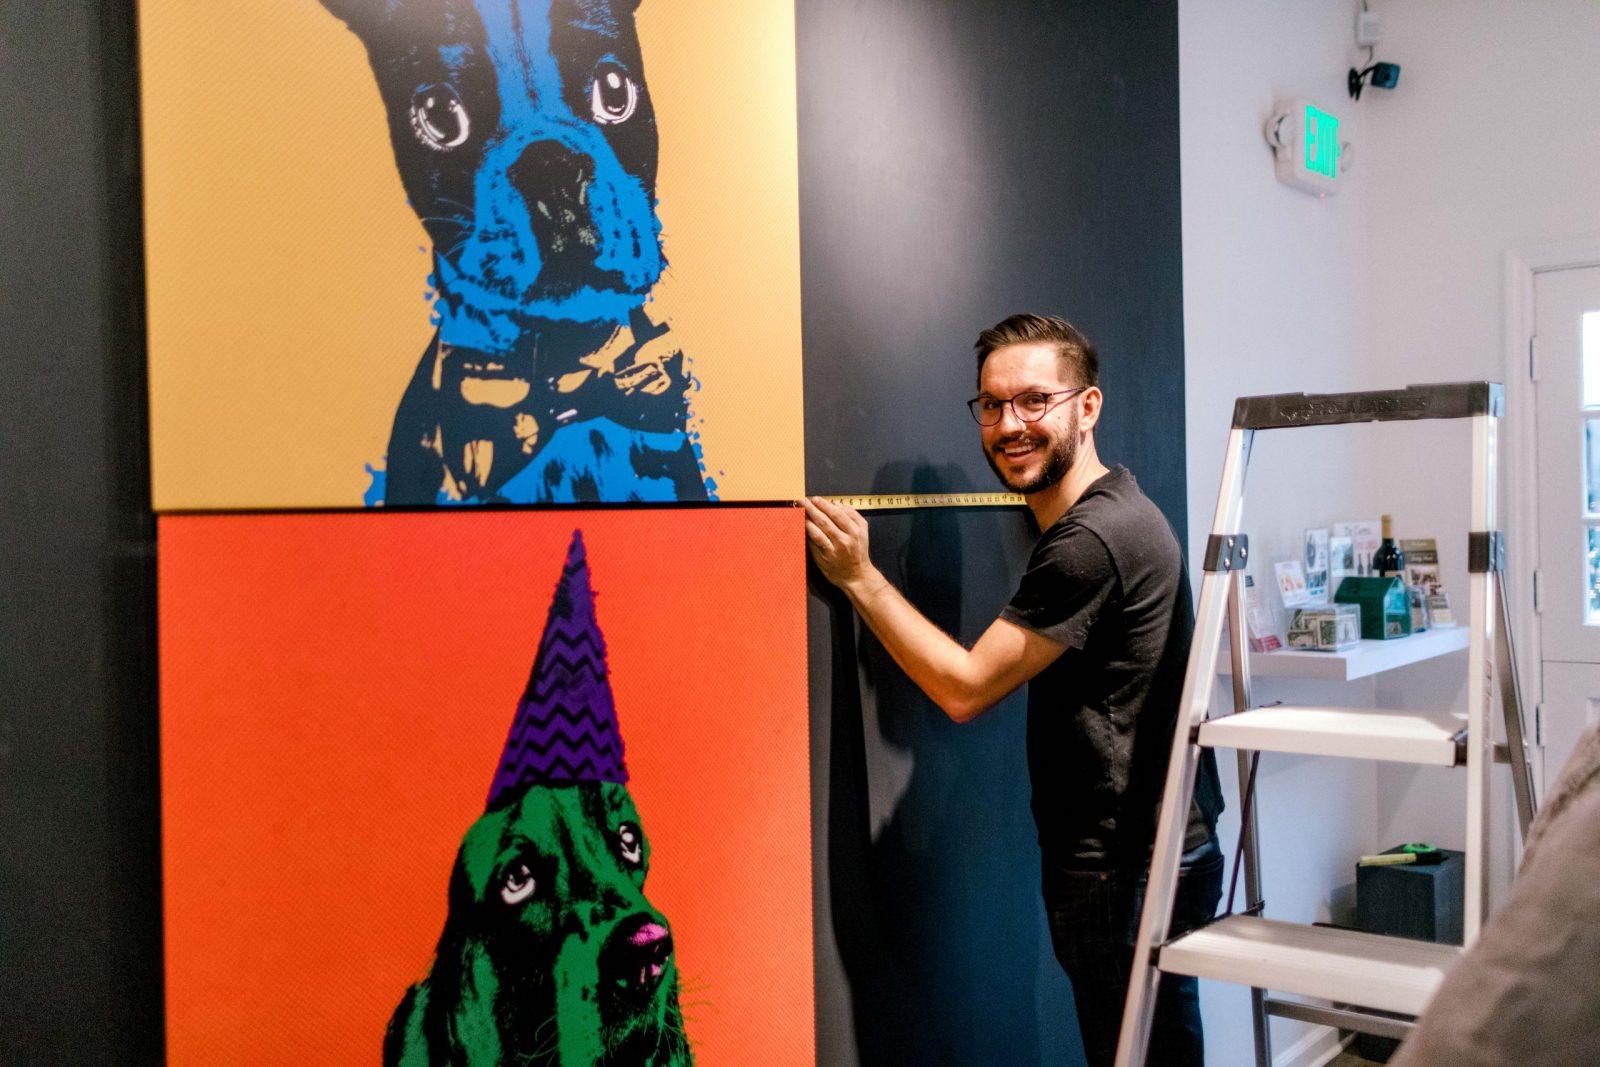 Barkis-Co-Design-Artist-Carmel-Dog-Installation-Custom-Abstract-Expressionism